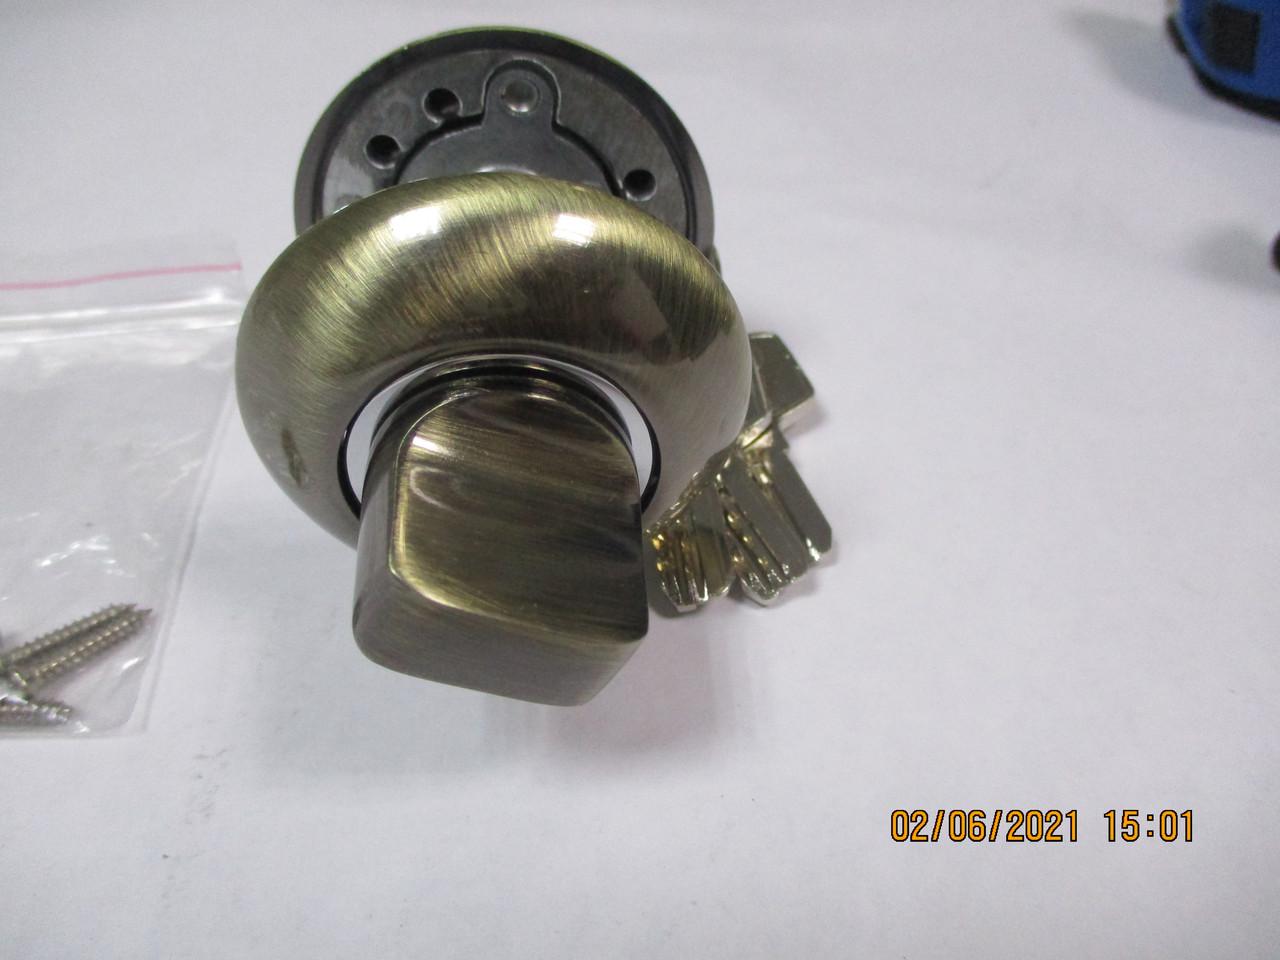 Фиксатор ключ R AB/CP DORMA (20/40) - фото 3